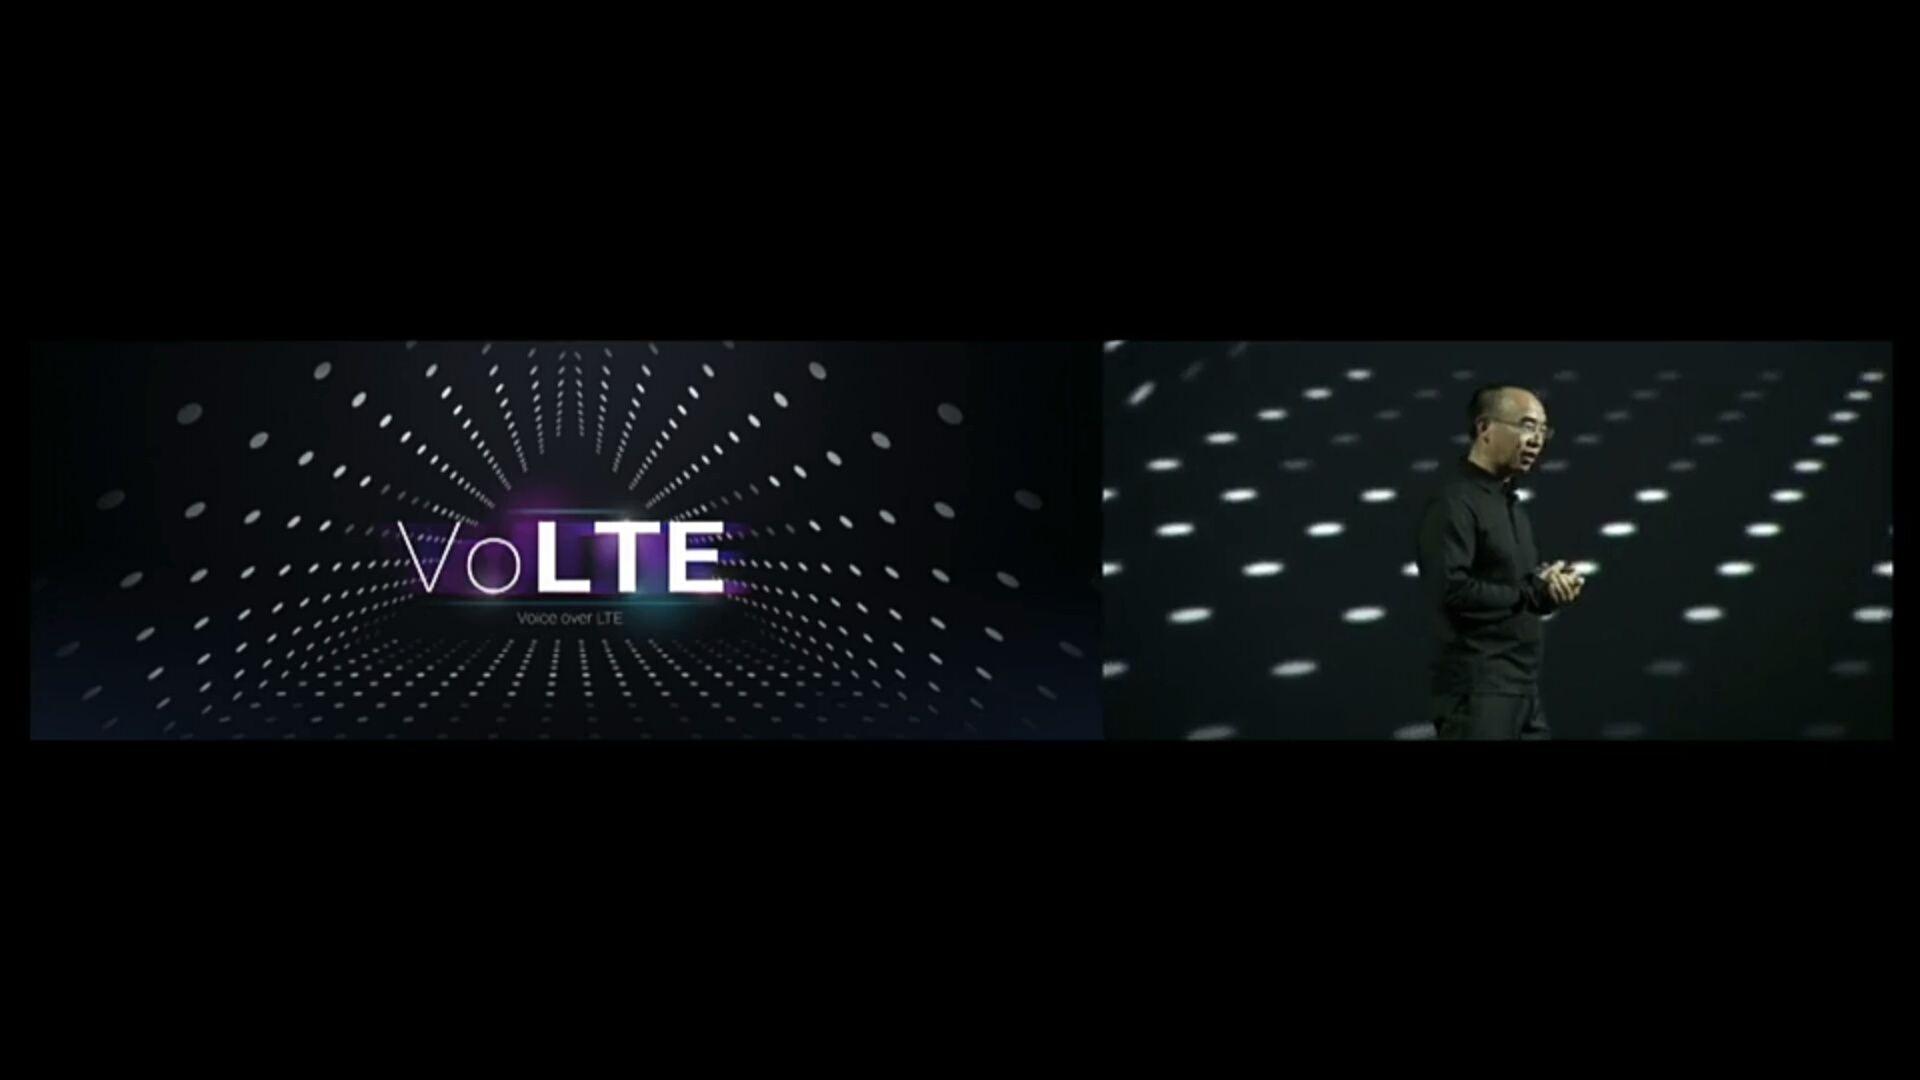 VoLTEオプションが有効になったMeizu Pro 5用Flyme OS 5.6.3.10 アーリーアダプター版がリリース